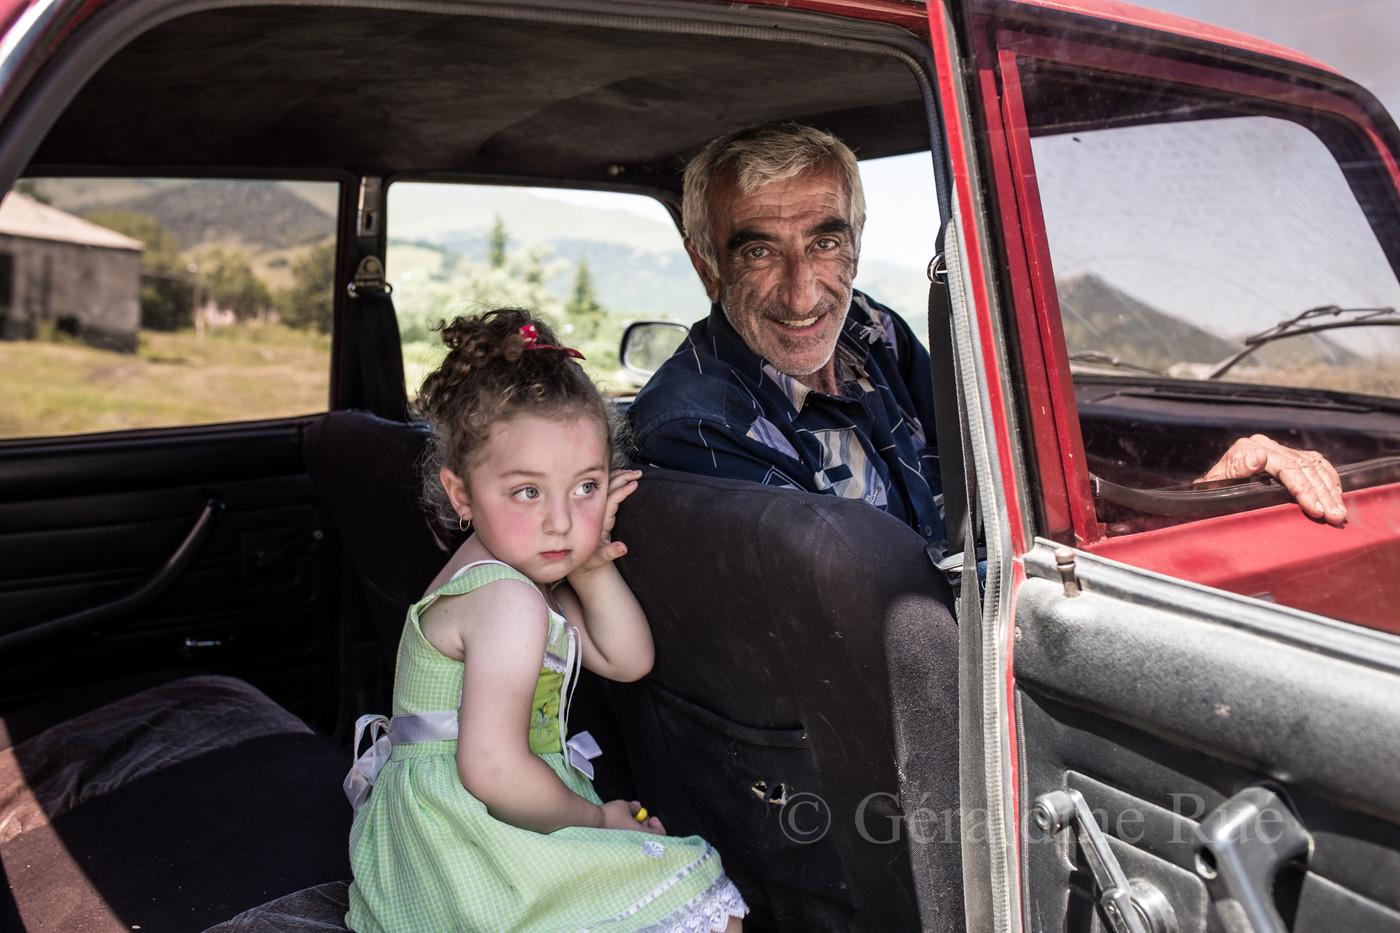 Arménie-Géorgie175636© Géraldine Rué.jpg